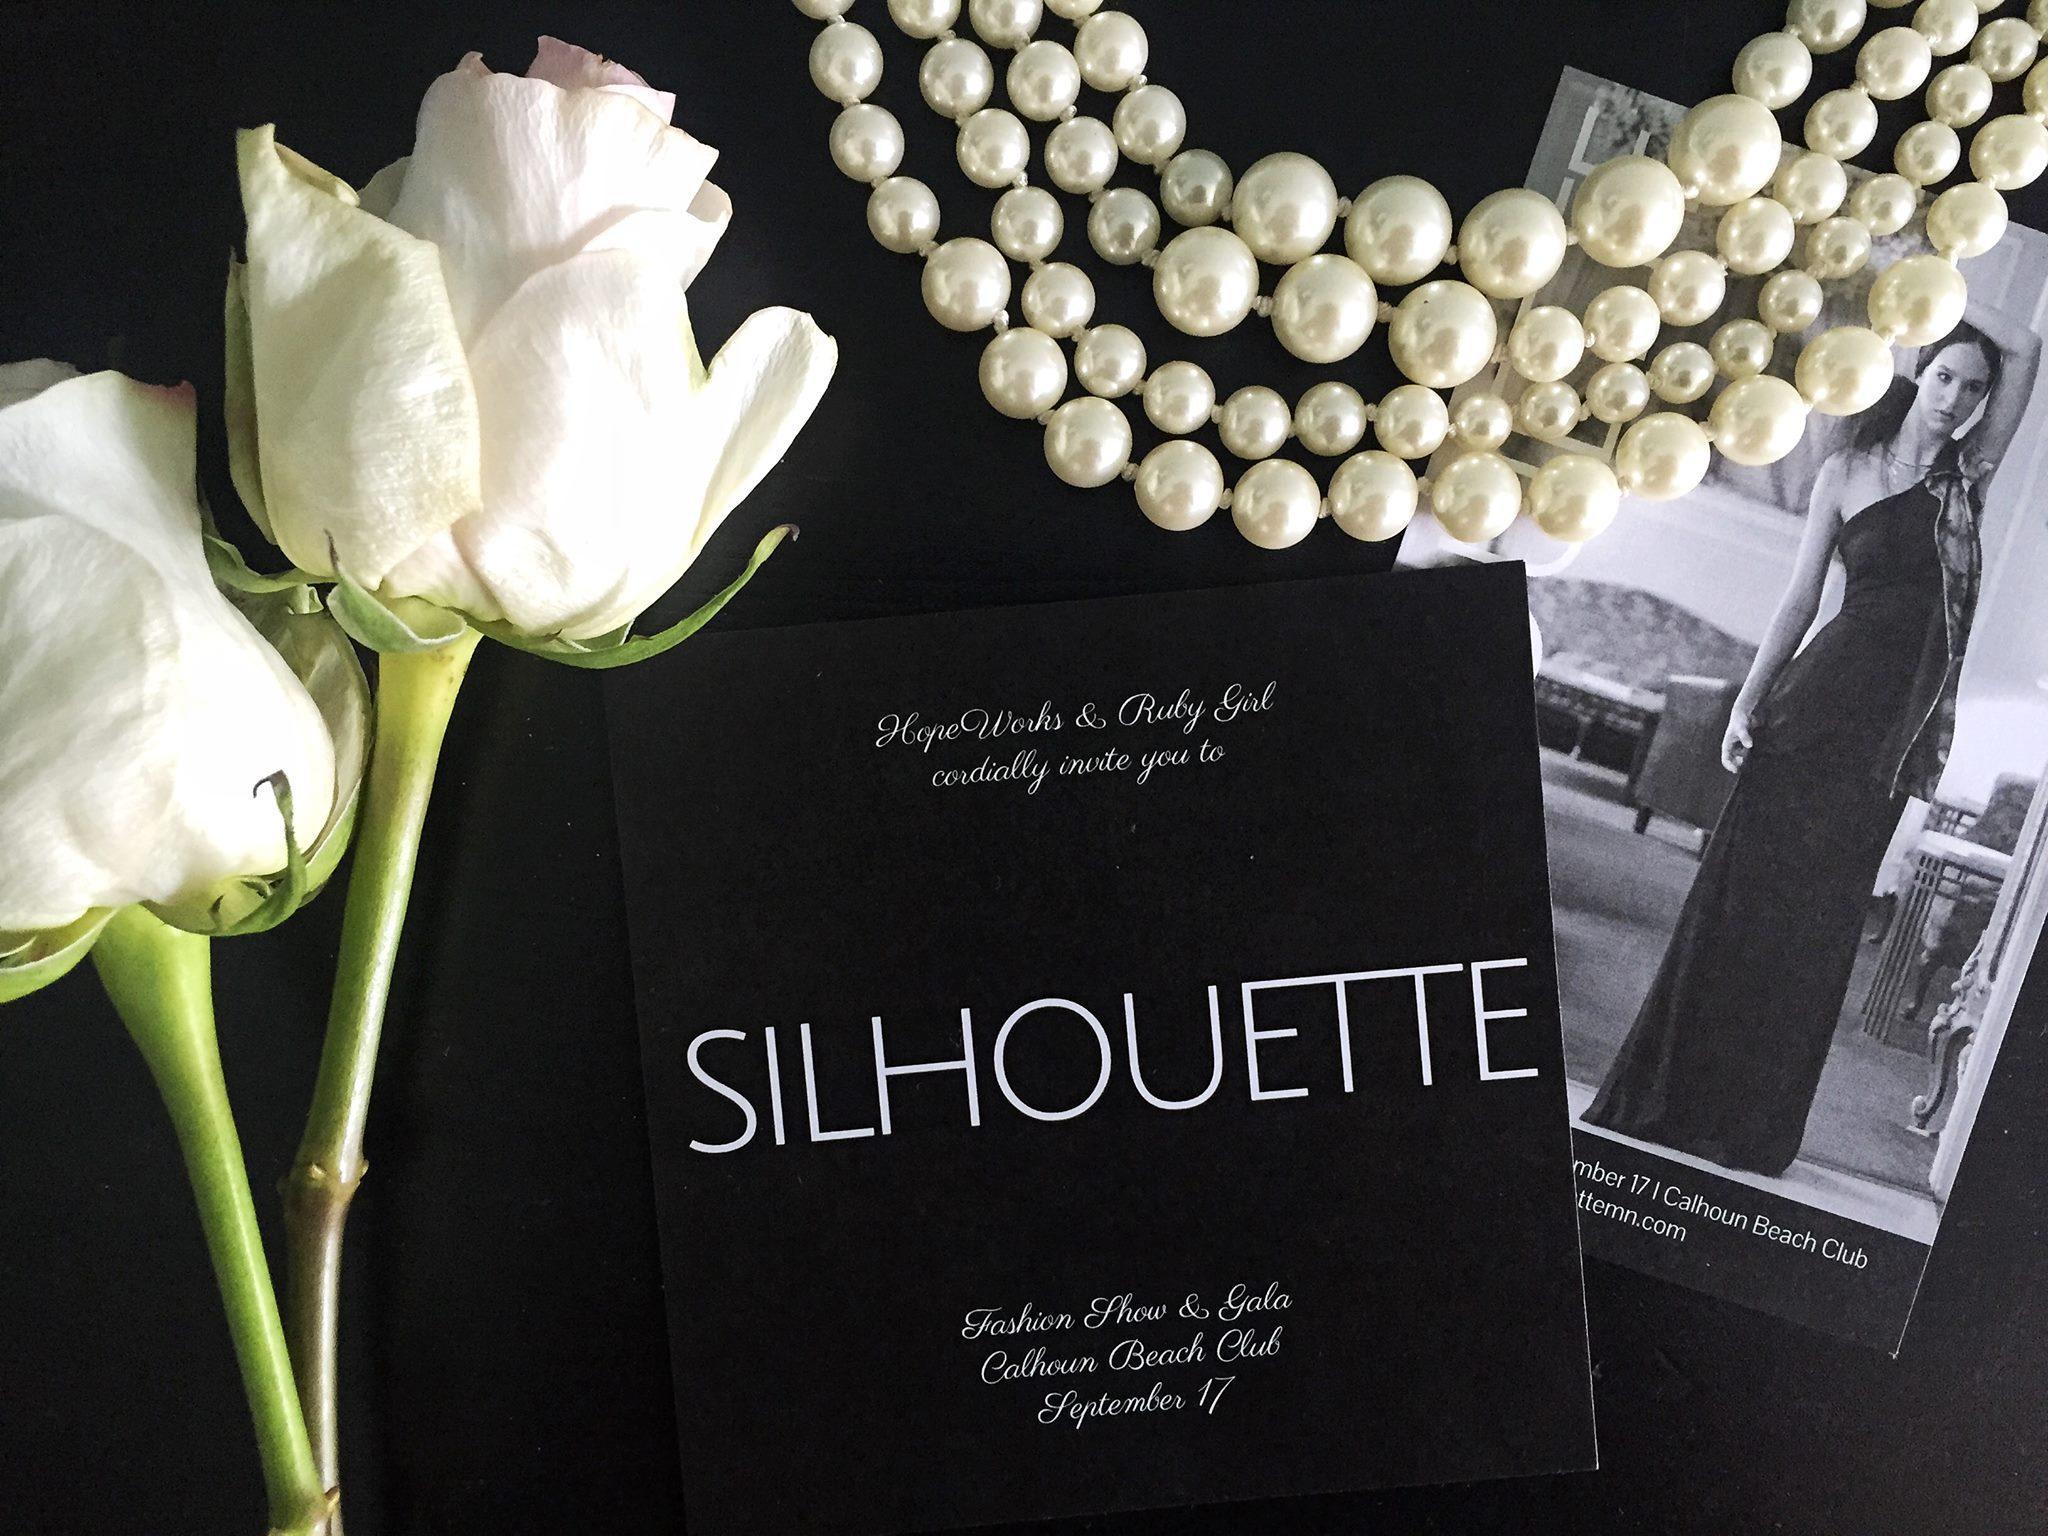 Silhouette MN Fashion Show